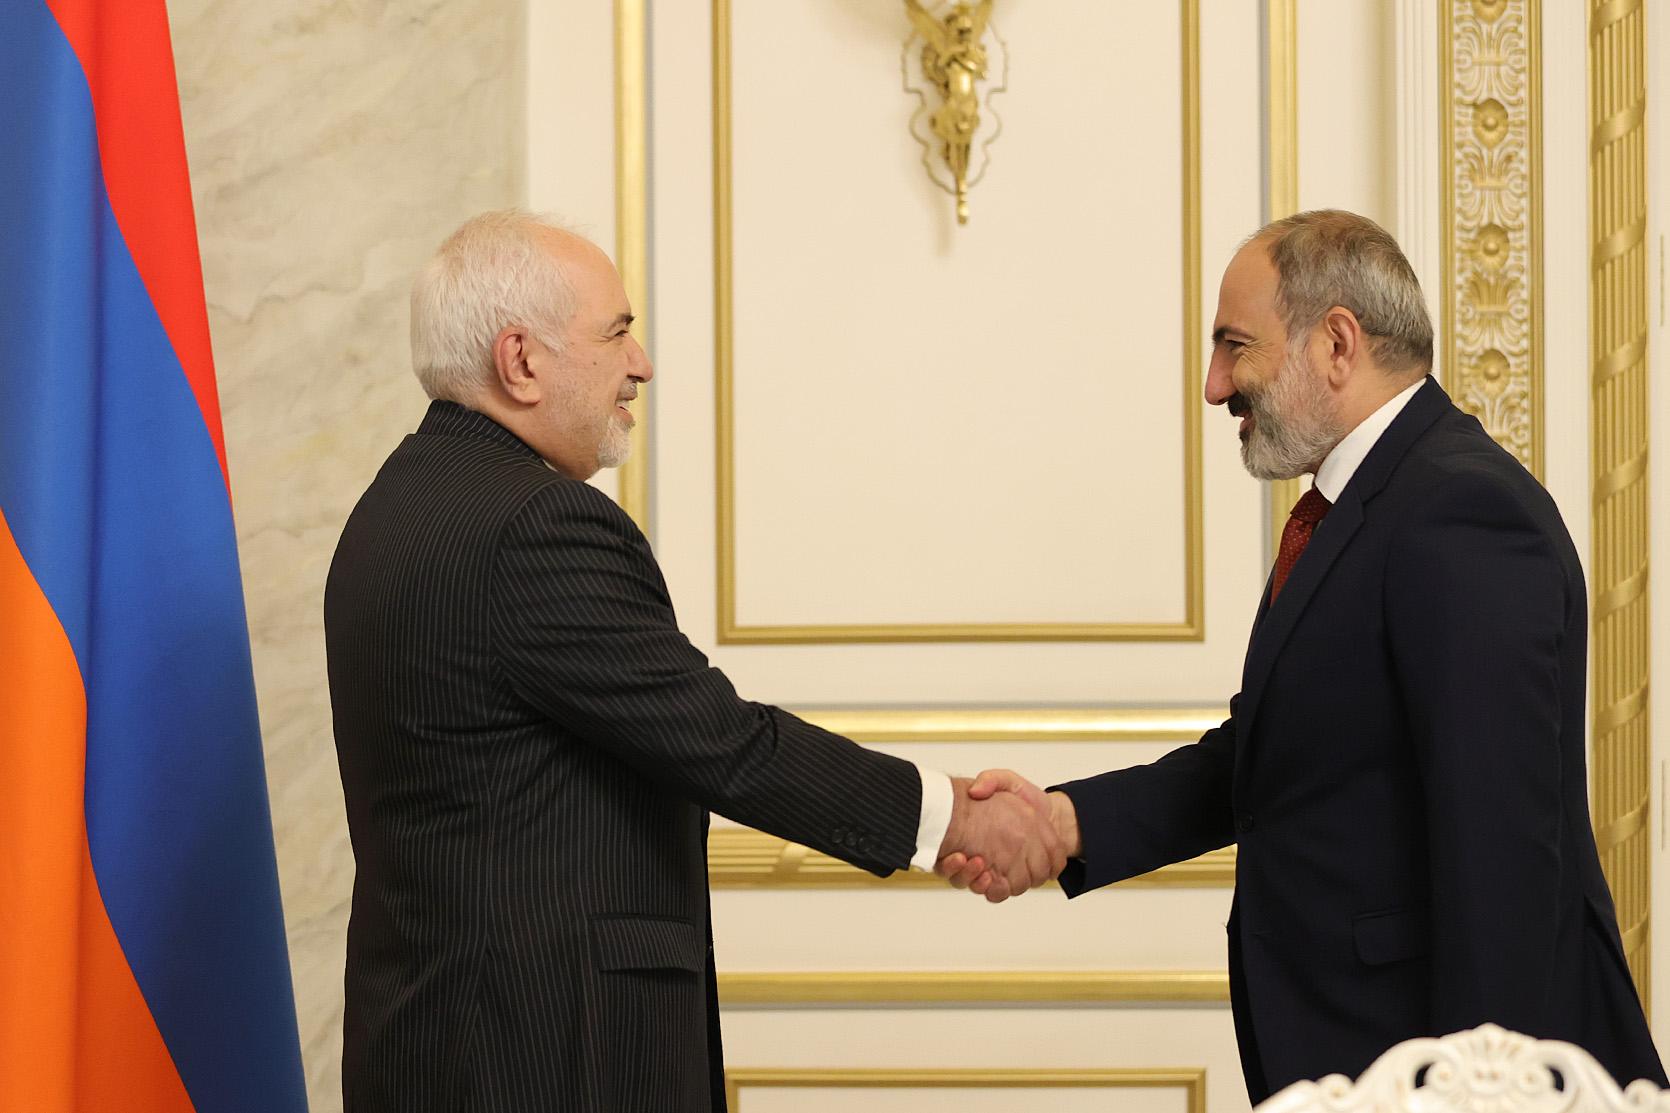 Никол Пашинян принял главу МИД Ирана Мохаммада Джавада Зарифа